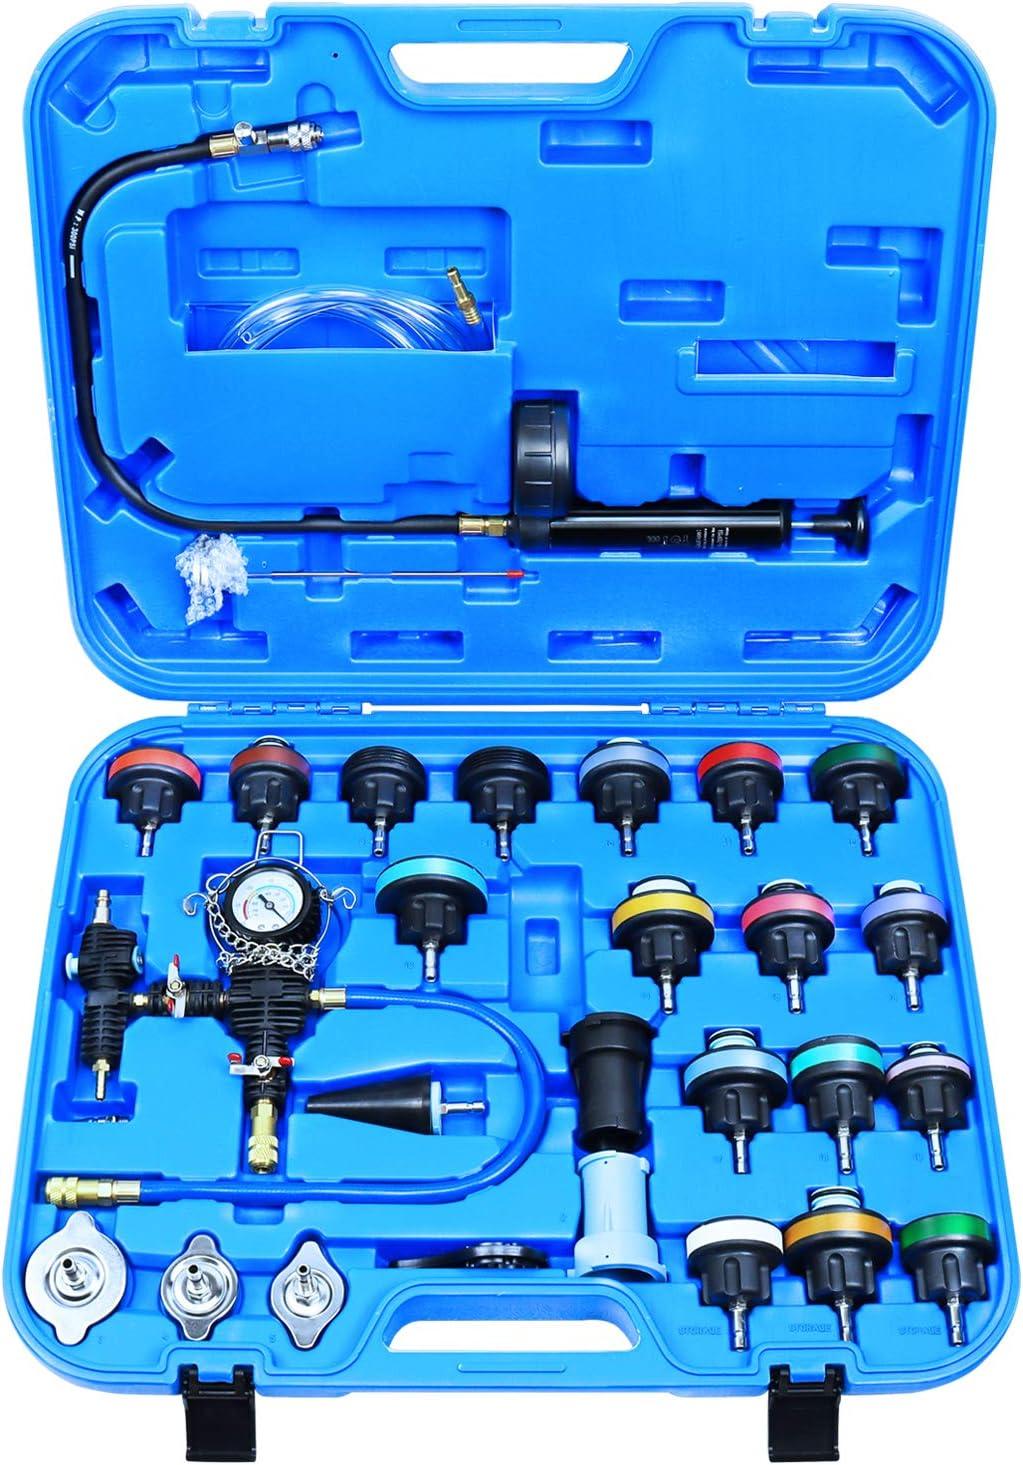 2021 new YSTOOL Radiator Pressure Tester Coolant Super sale 28PCS Refill Vacuum Kit